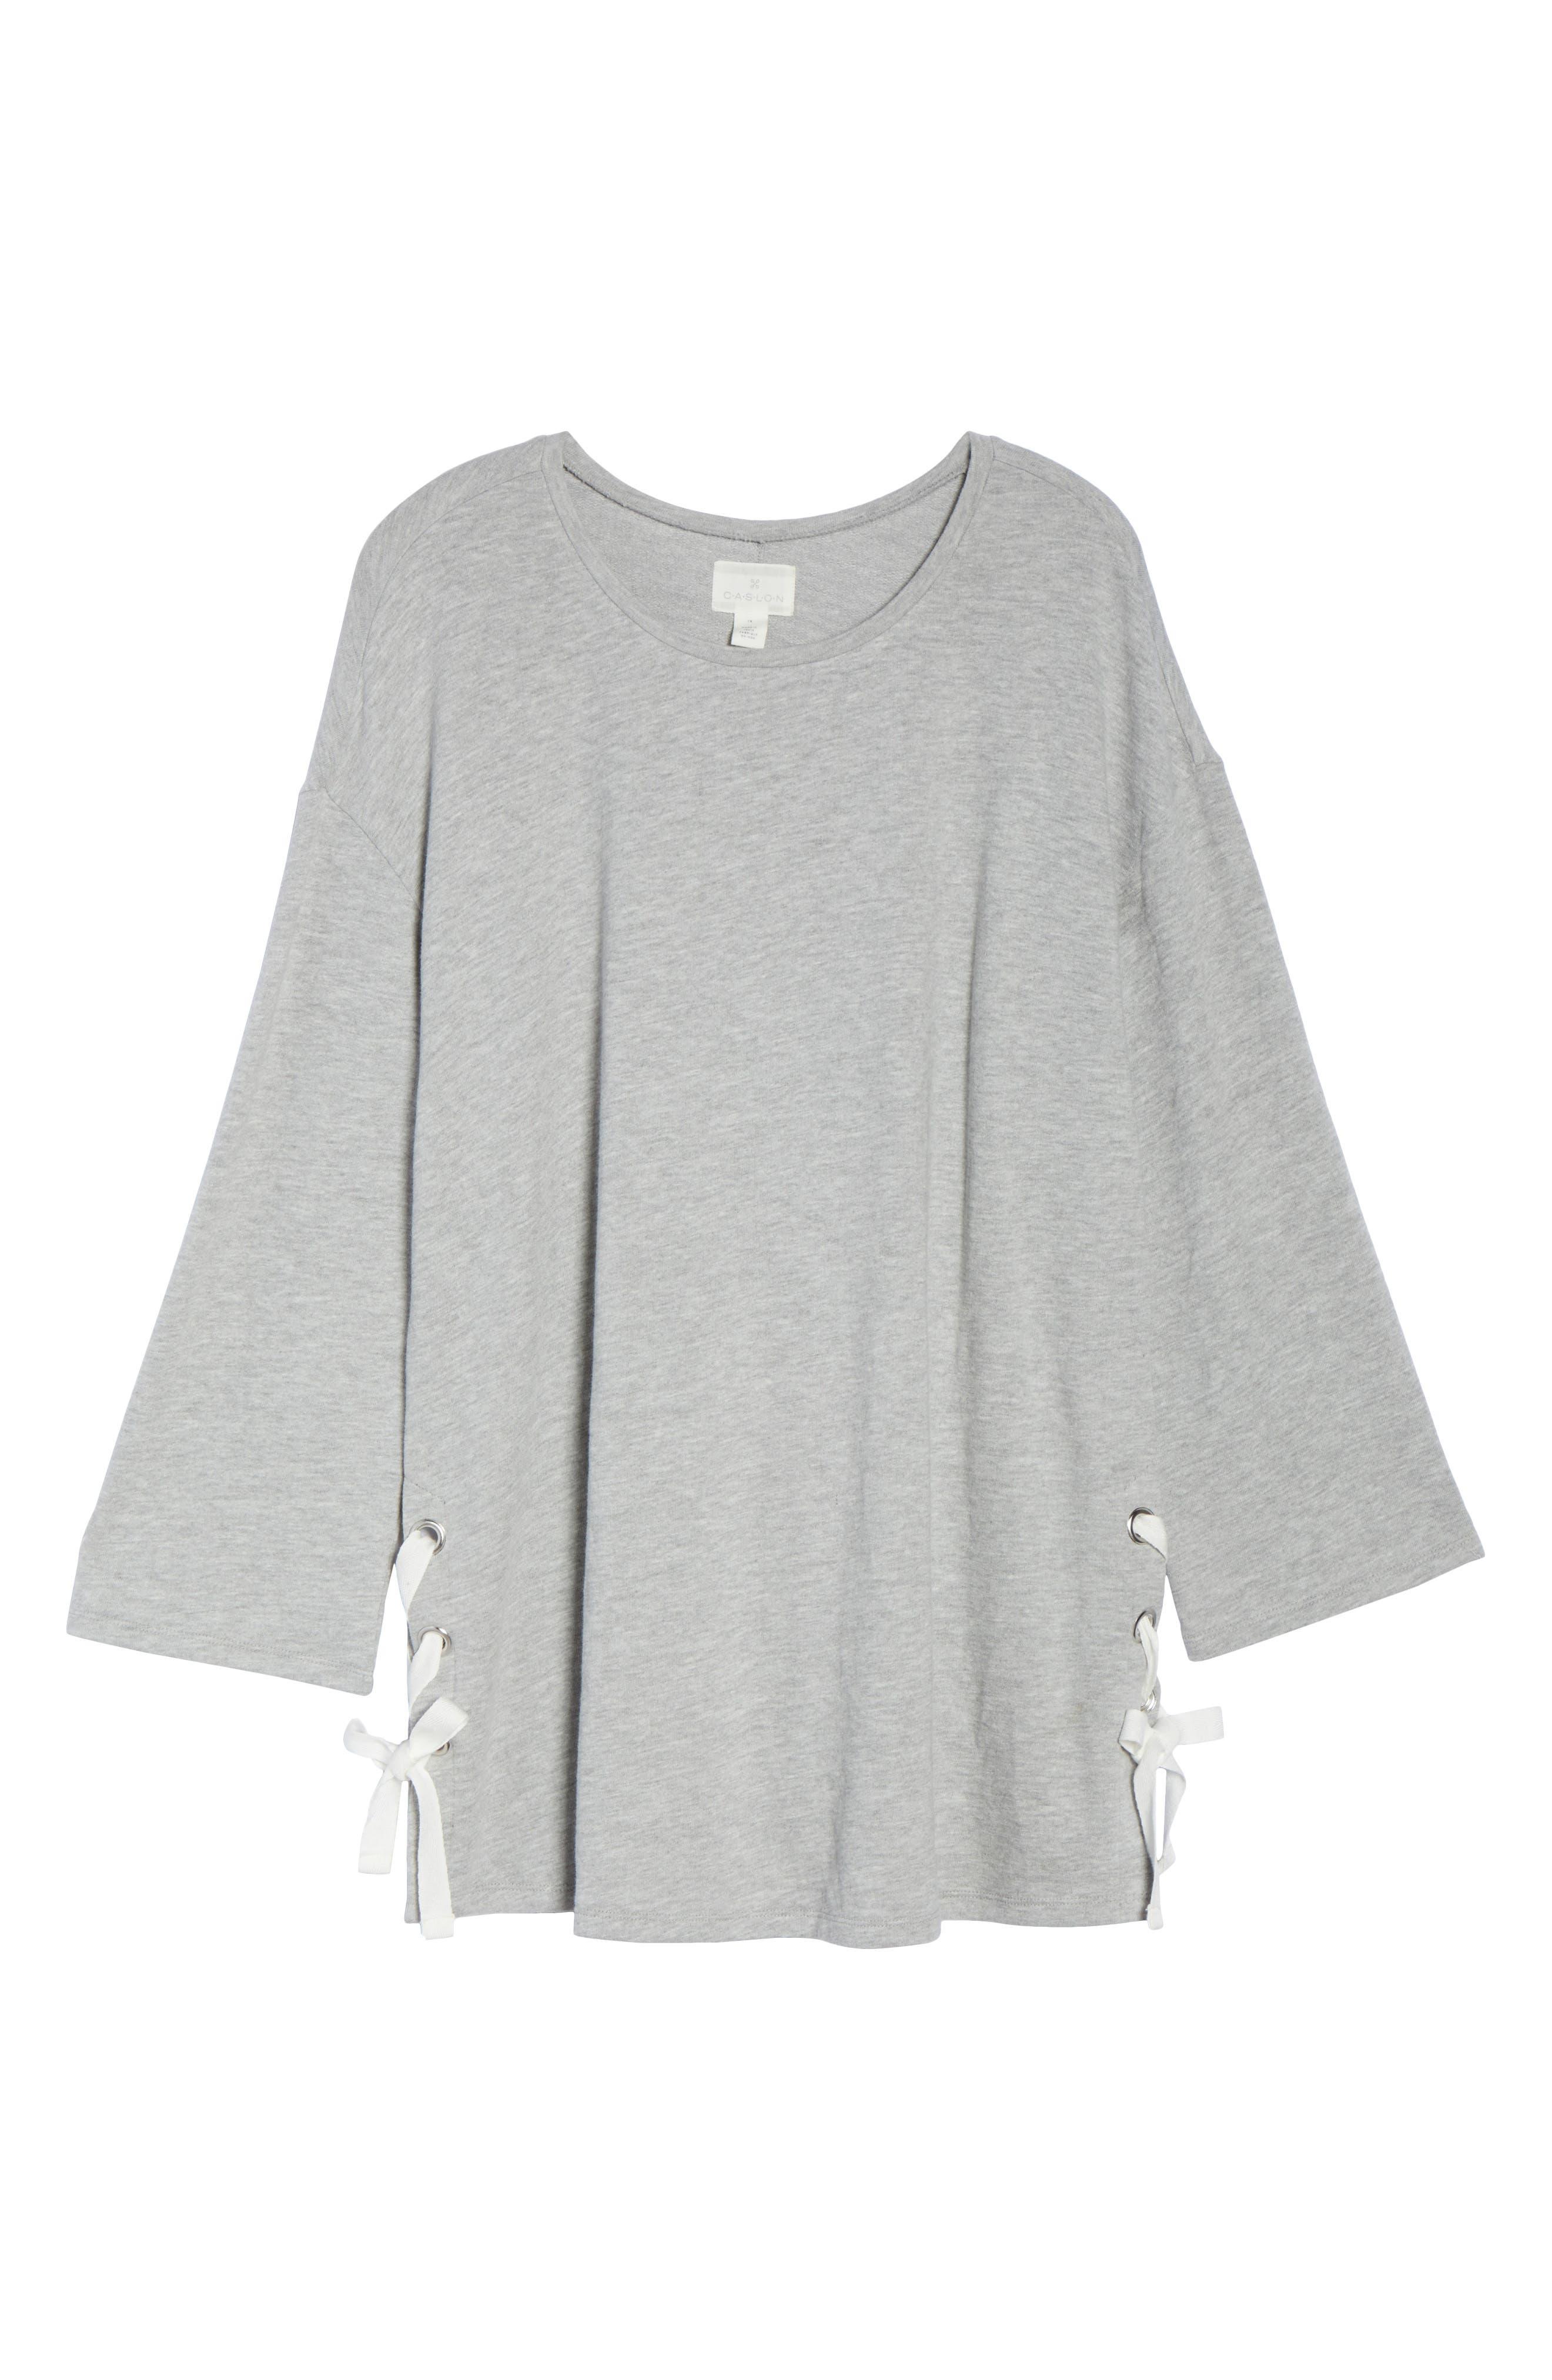 Lace-Up Side Sweatshirt,                             Alternate thumbnail 5, color,                             Grey Heather